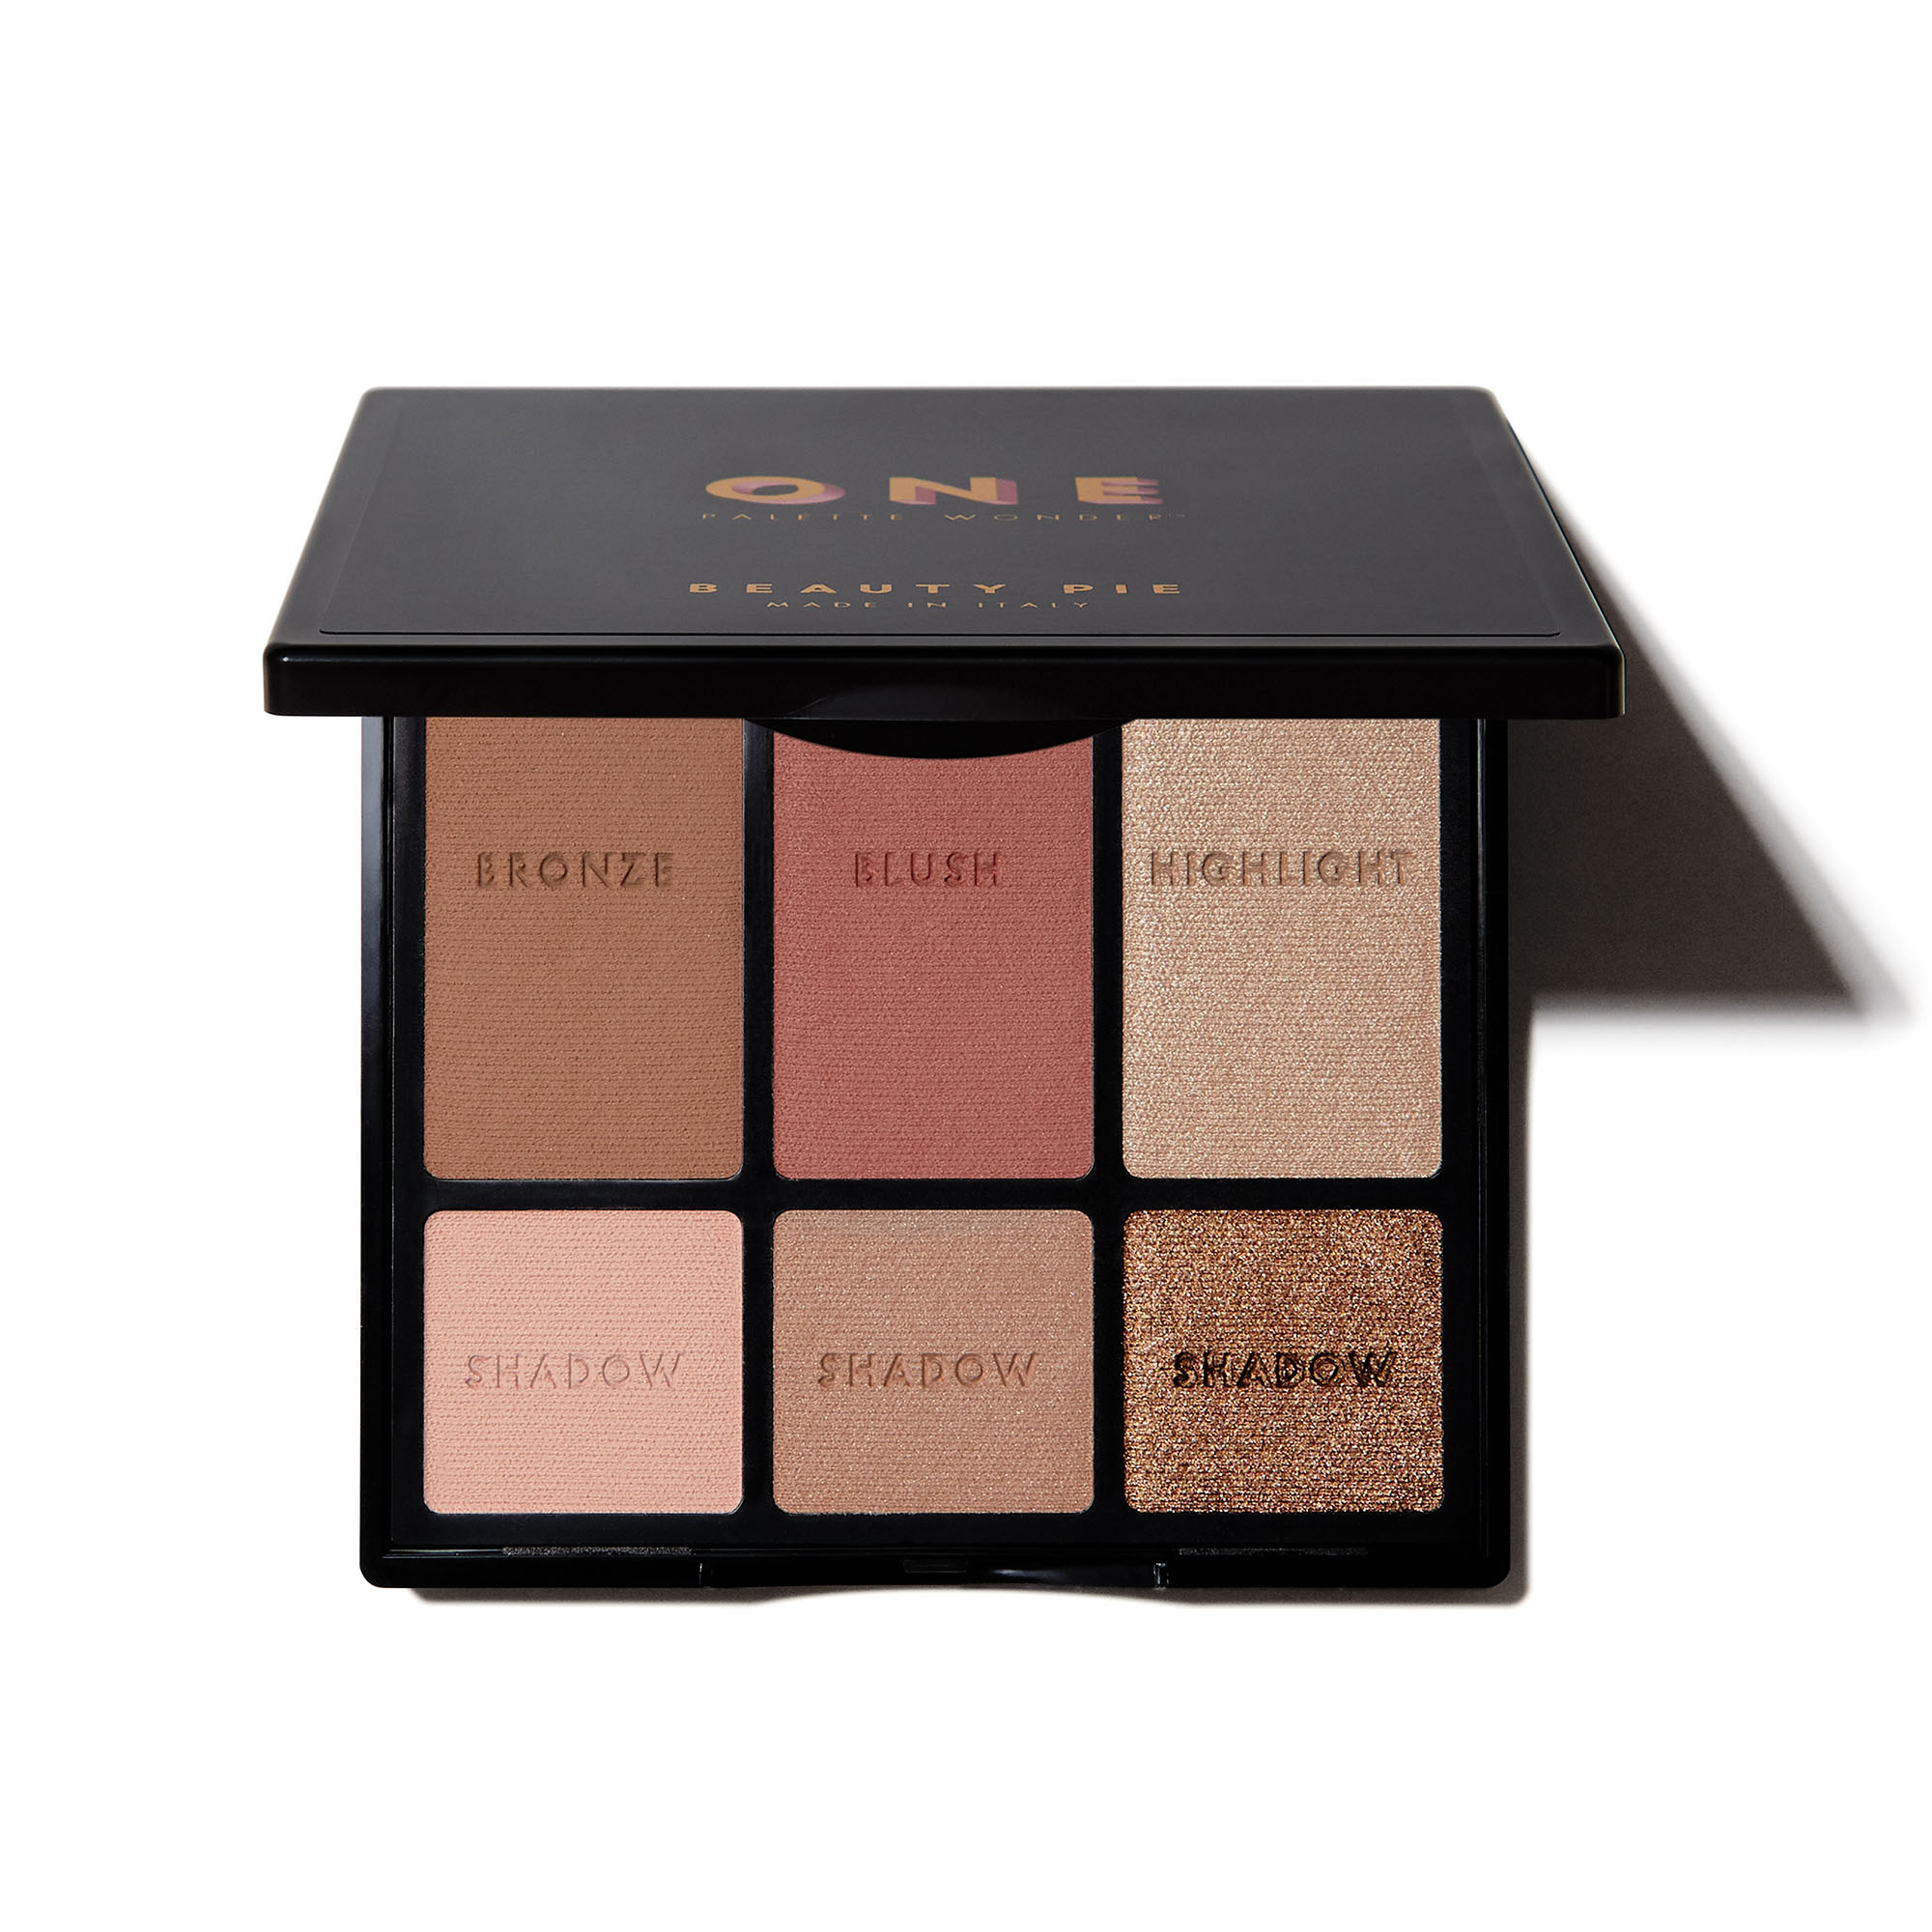 One Palette Wonder eyeshadow palette with neutral tones